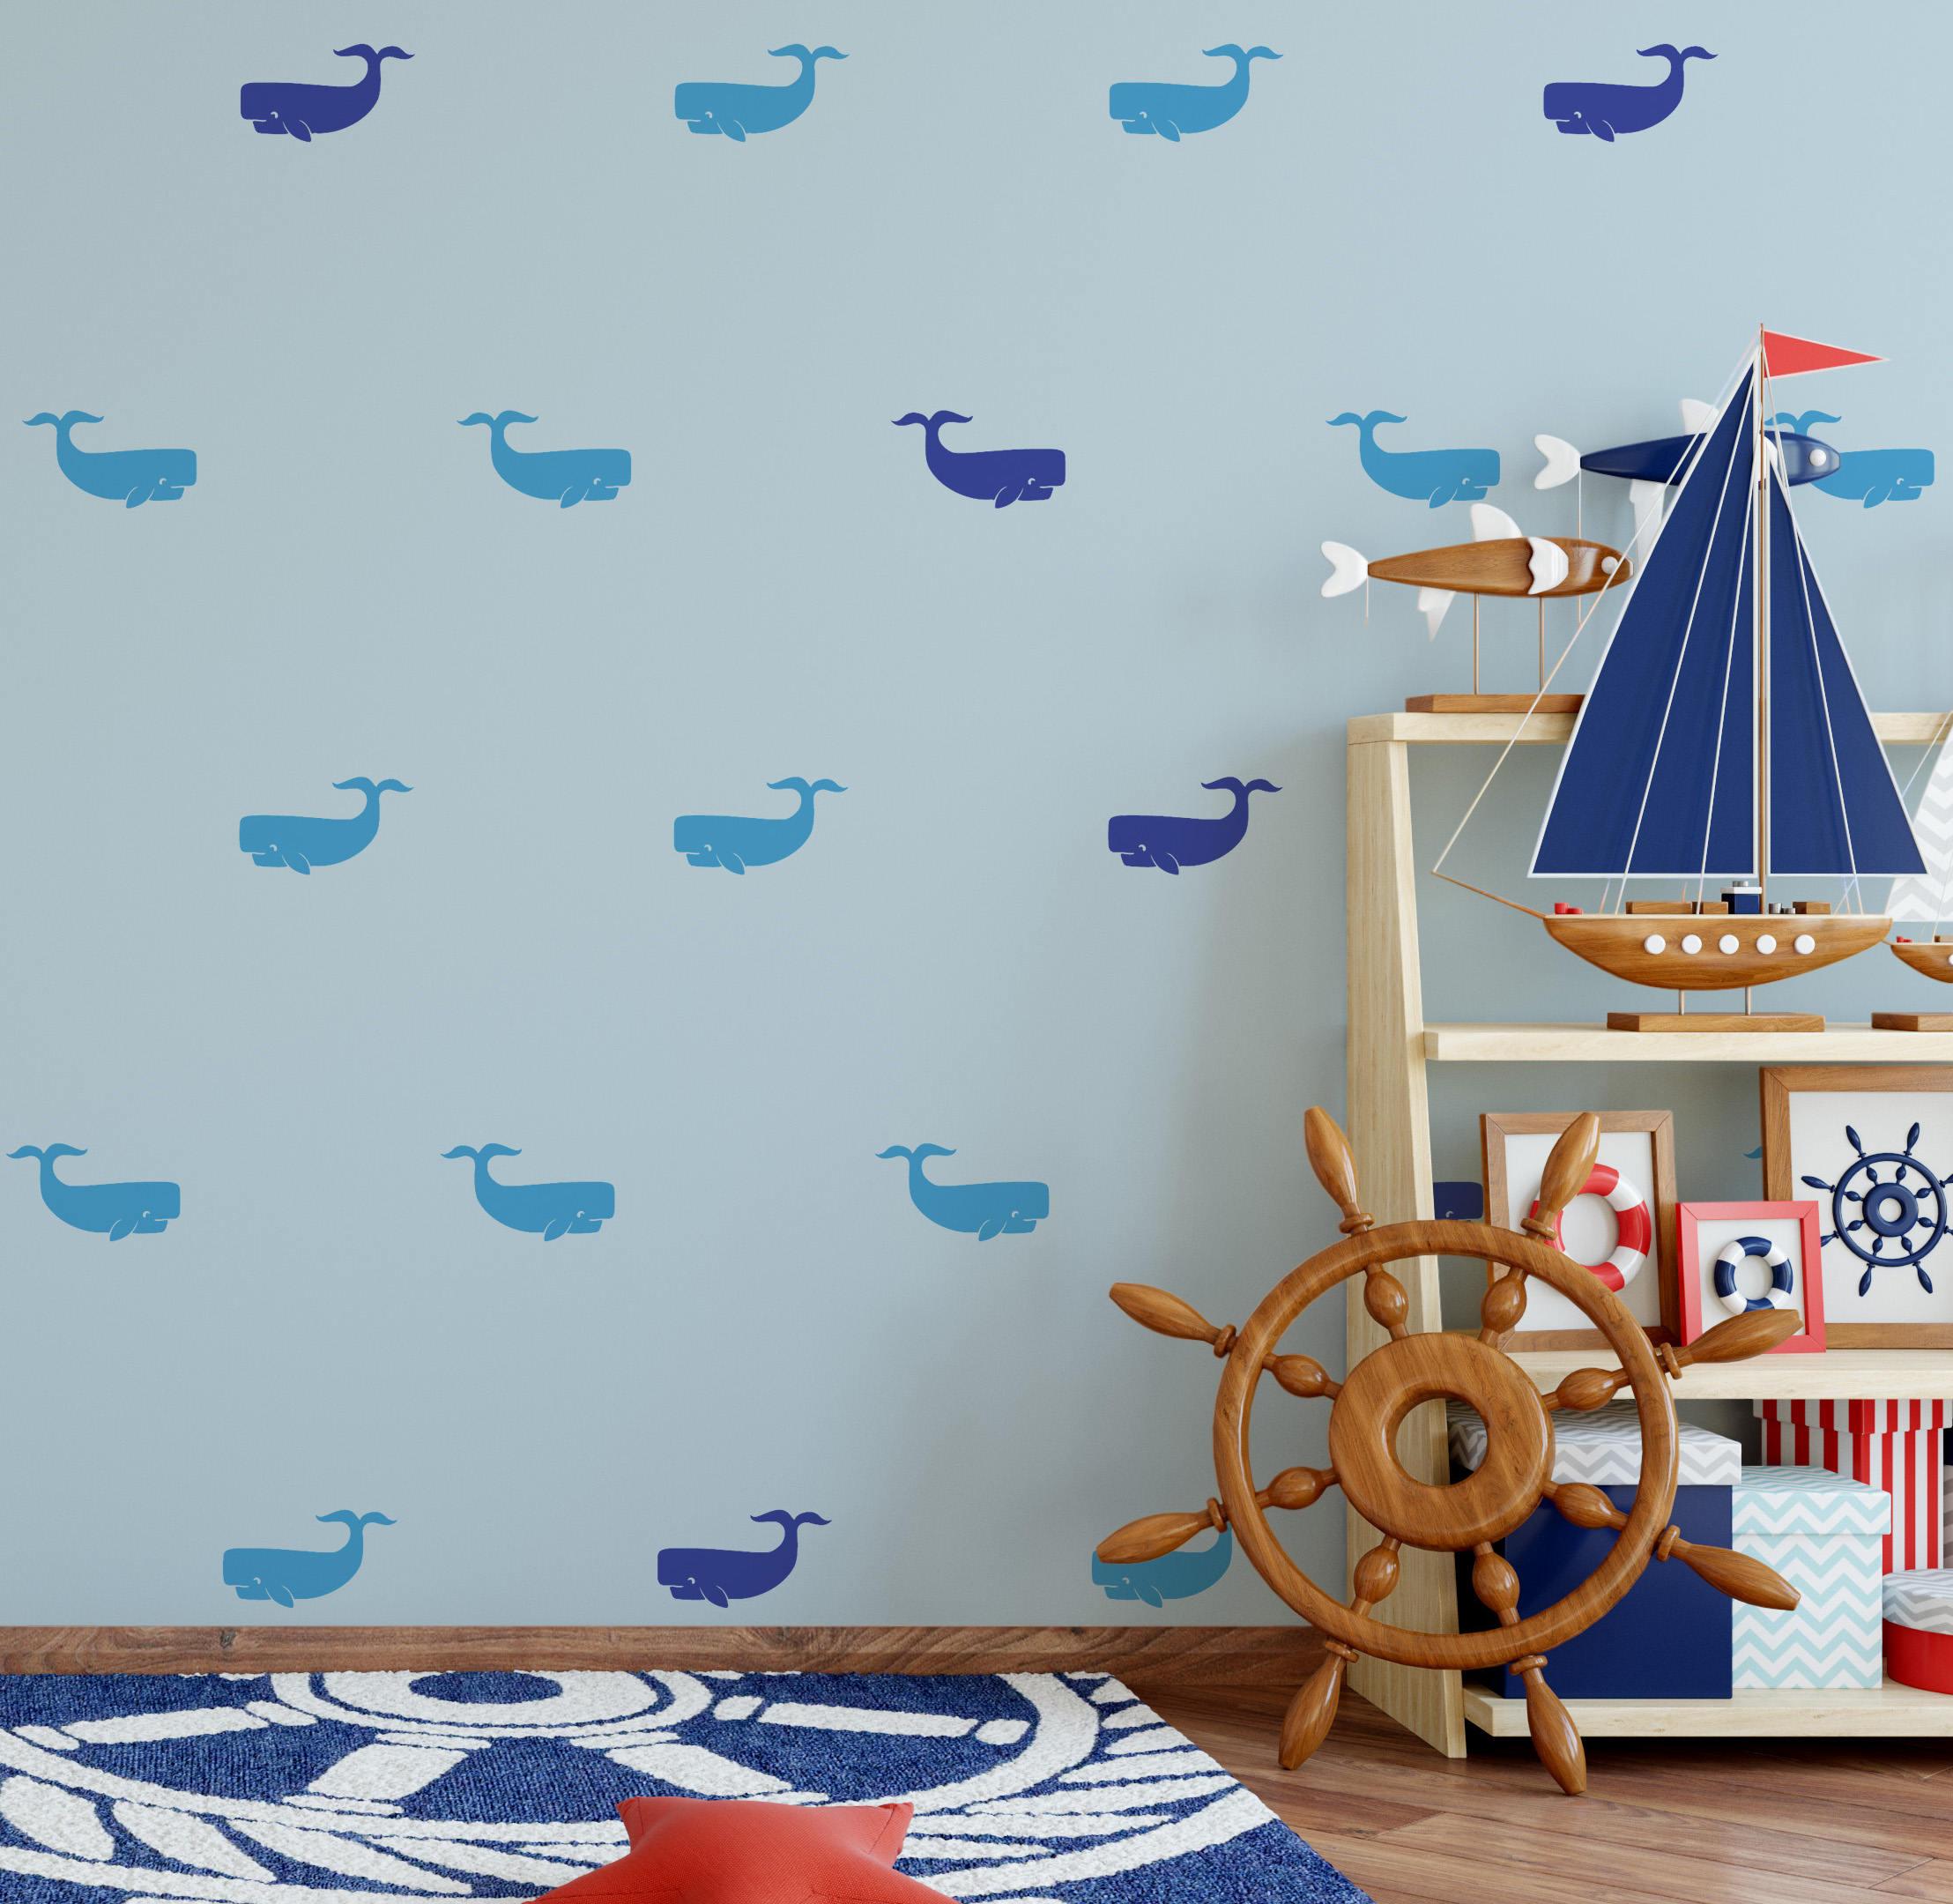 Whale Wall Decal Kids Room Wall Decal Nursery Wall Decor Fish